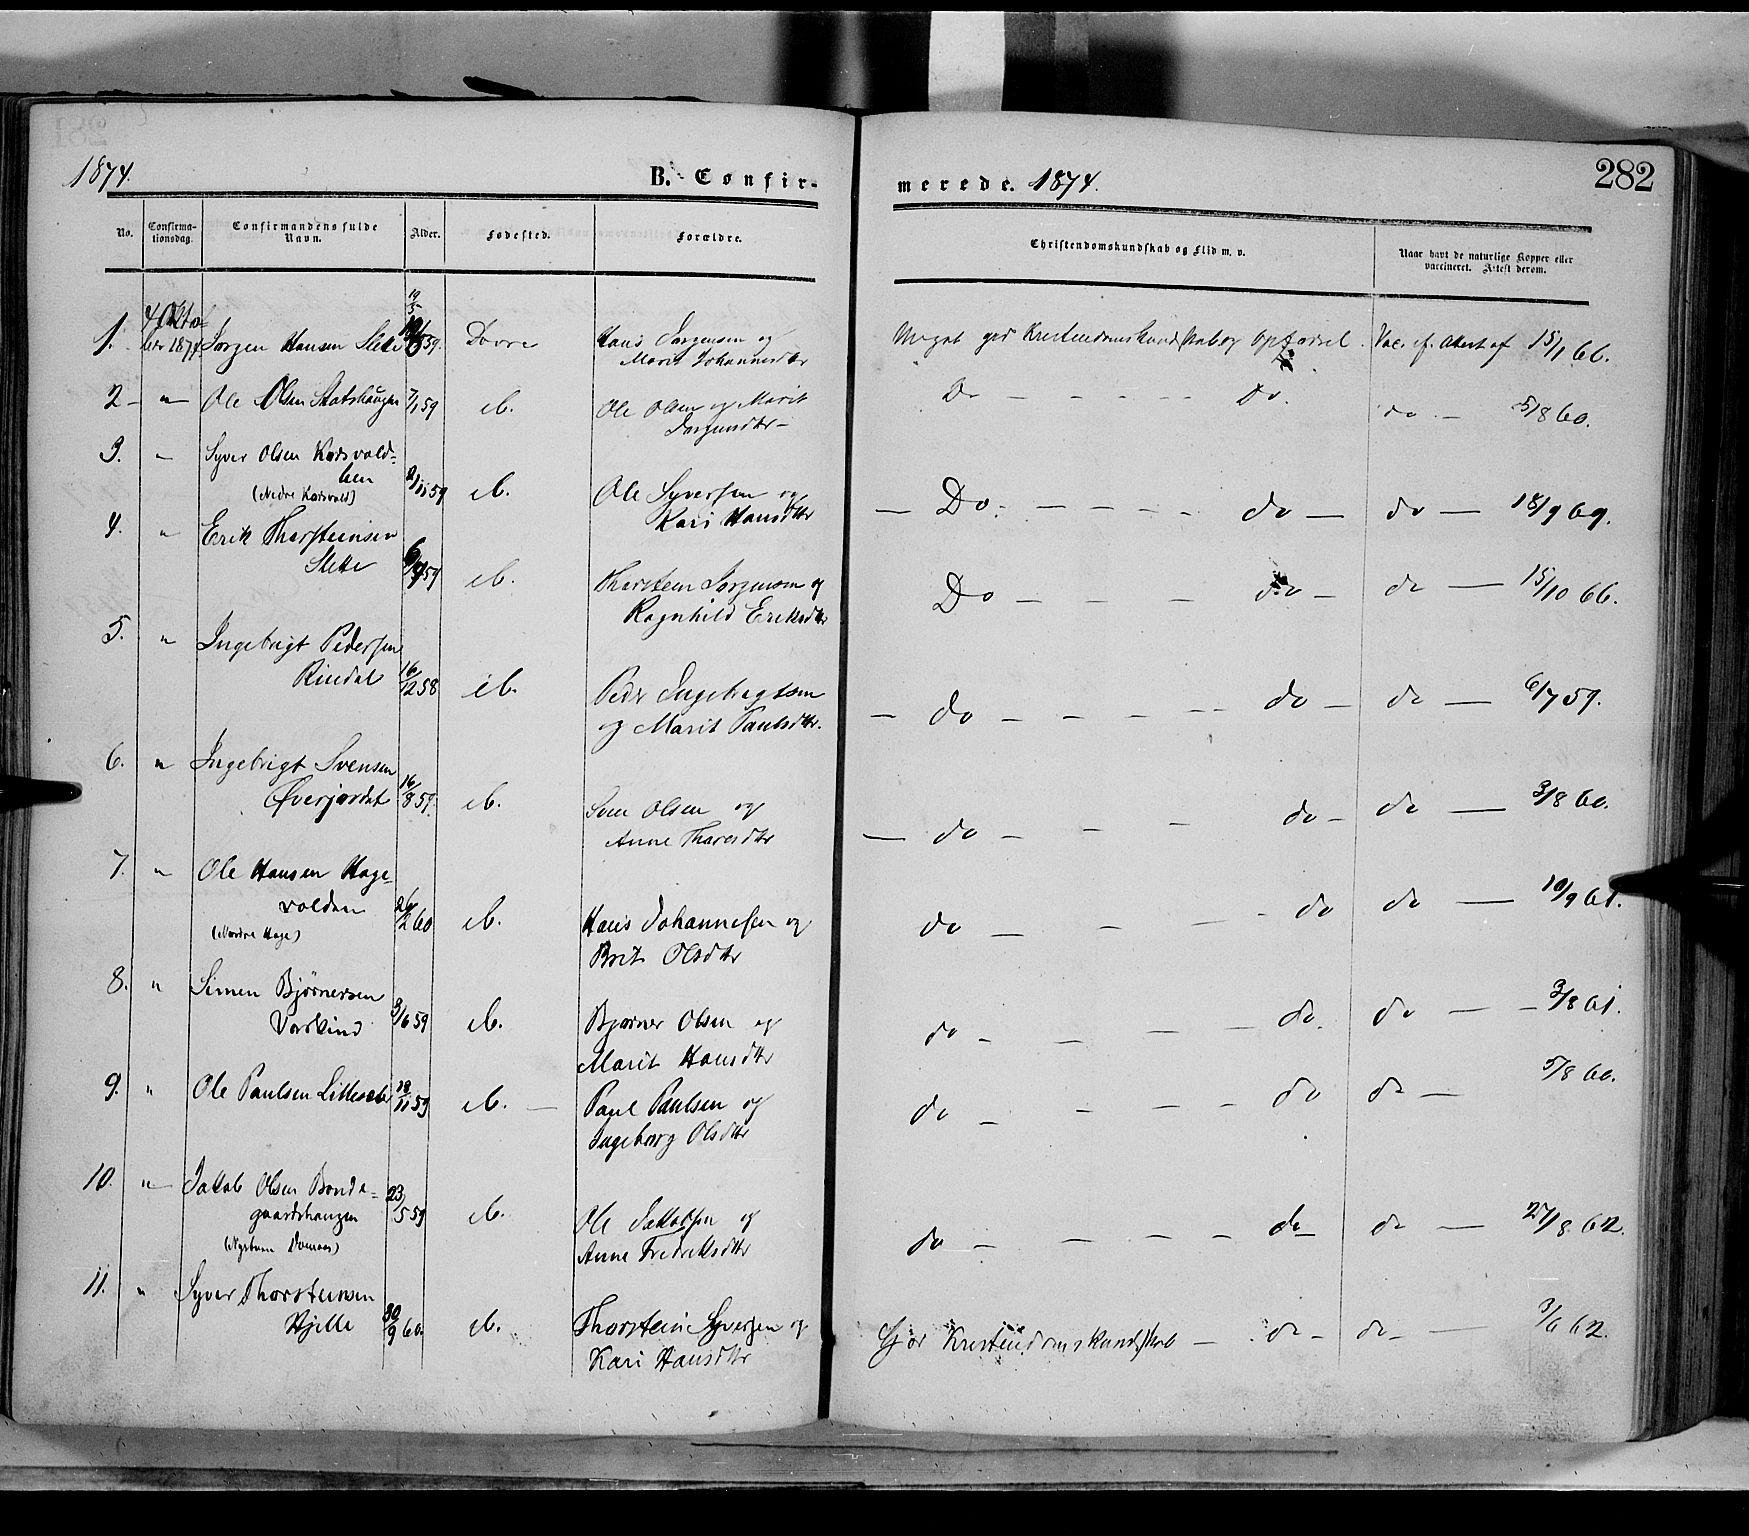 SAH, Dovre prestekontor, Ministerialbok nr. 1, 1854-1878, s. 282